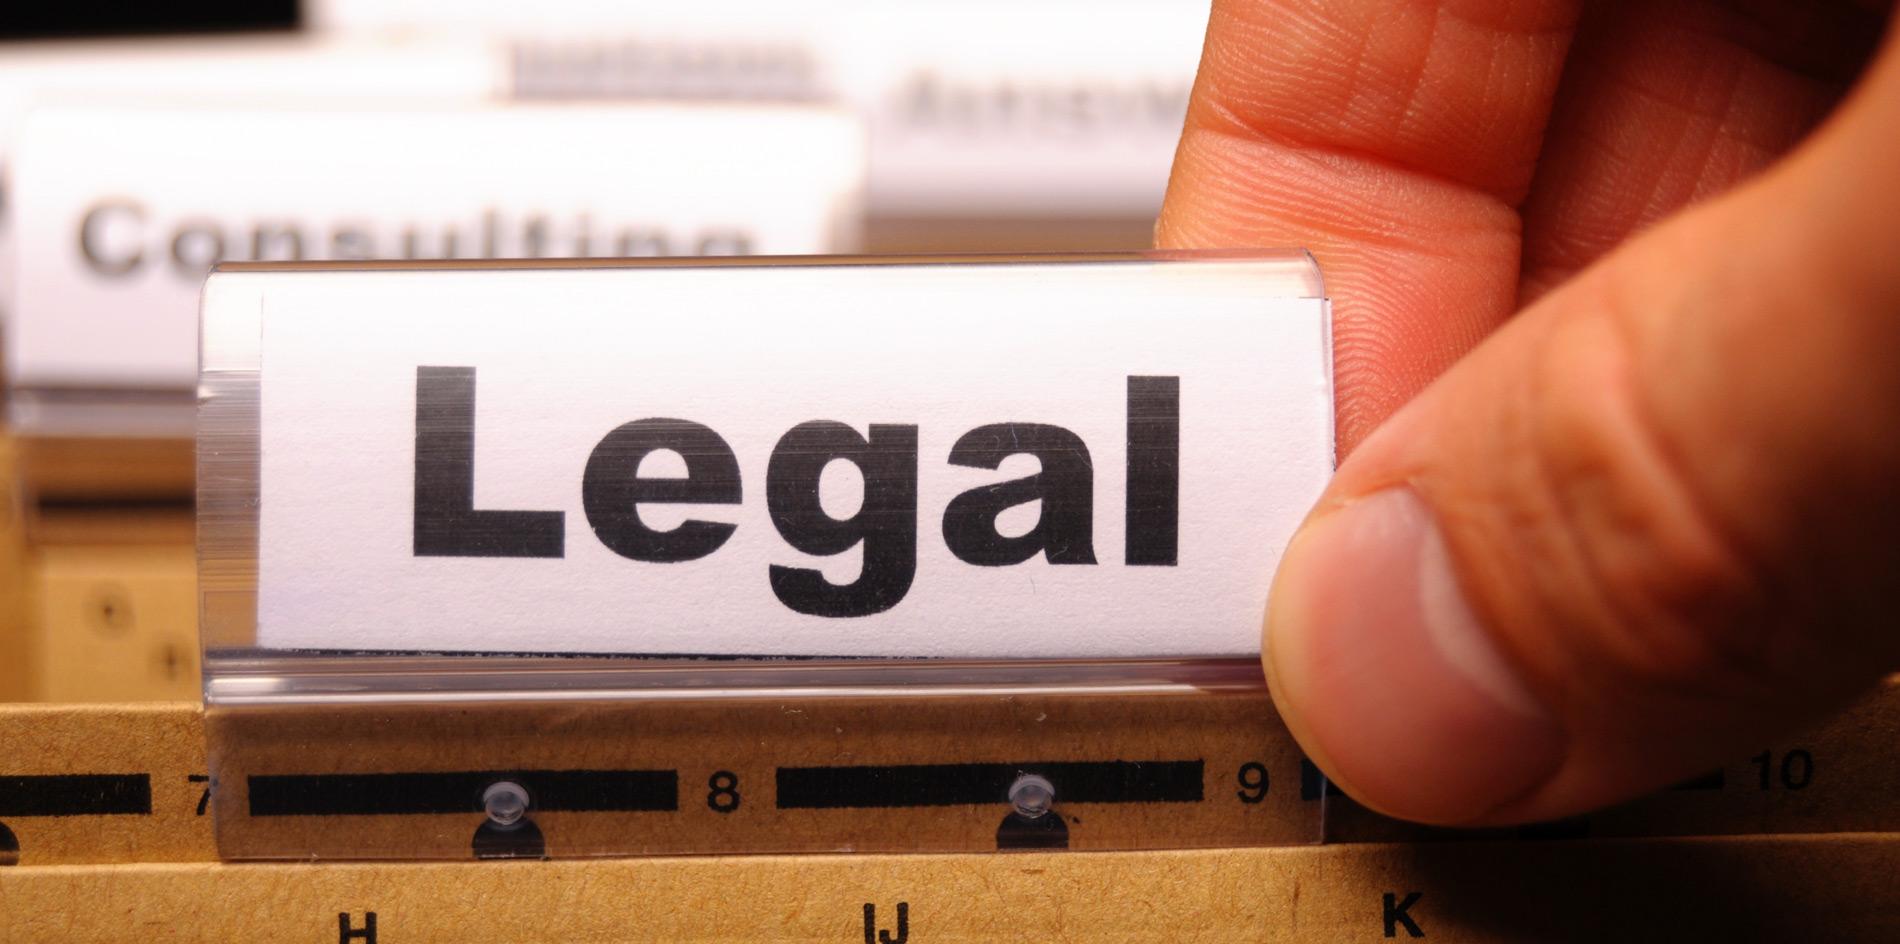 http://www.sheriflawfirm.com/wp-content/uploads/2017/01/practice-criminal-law.jpg